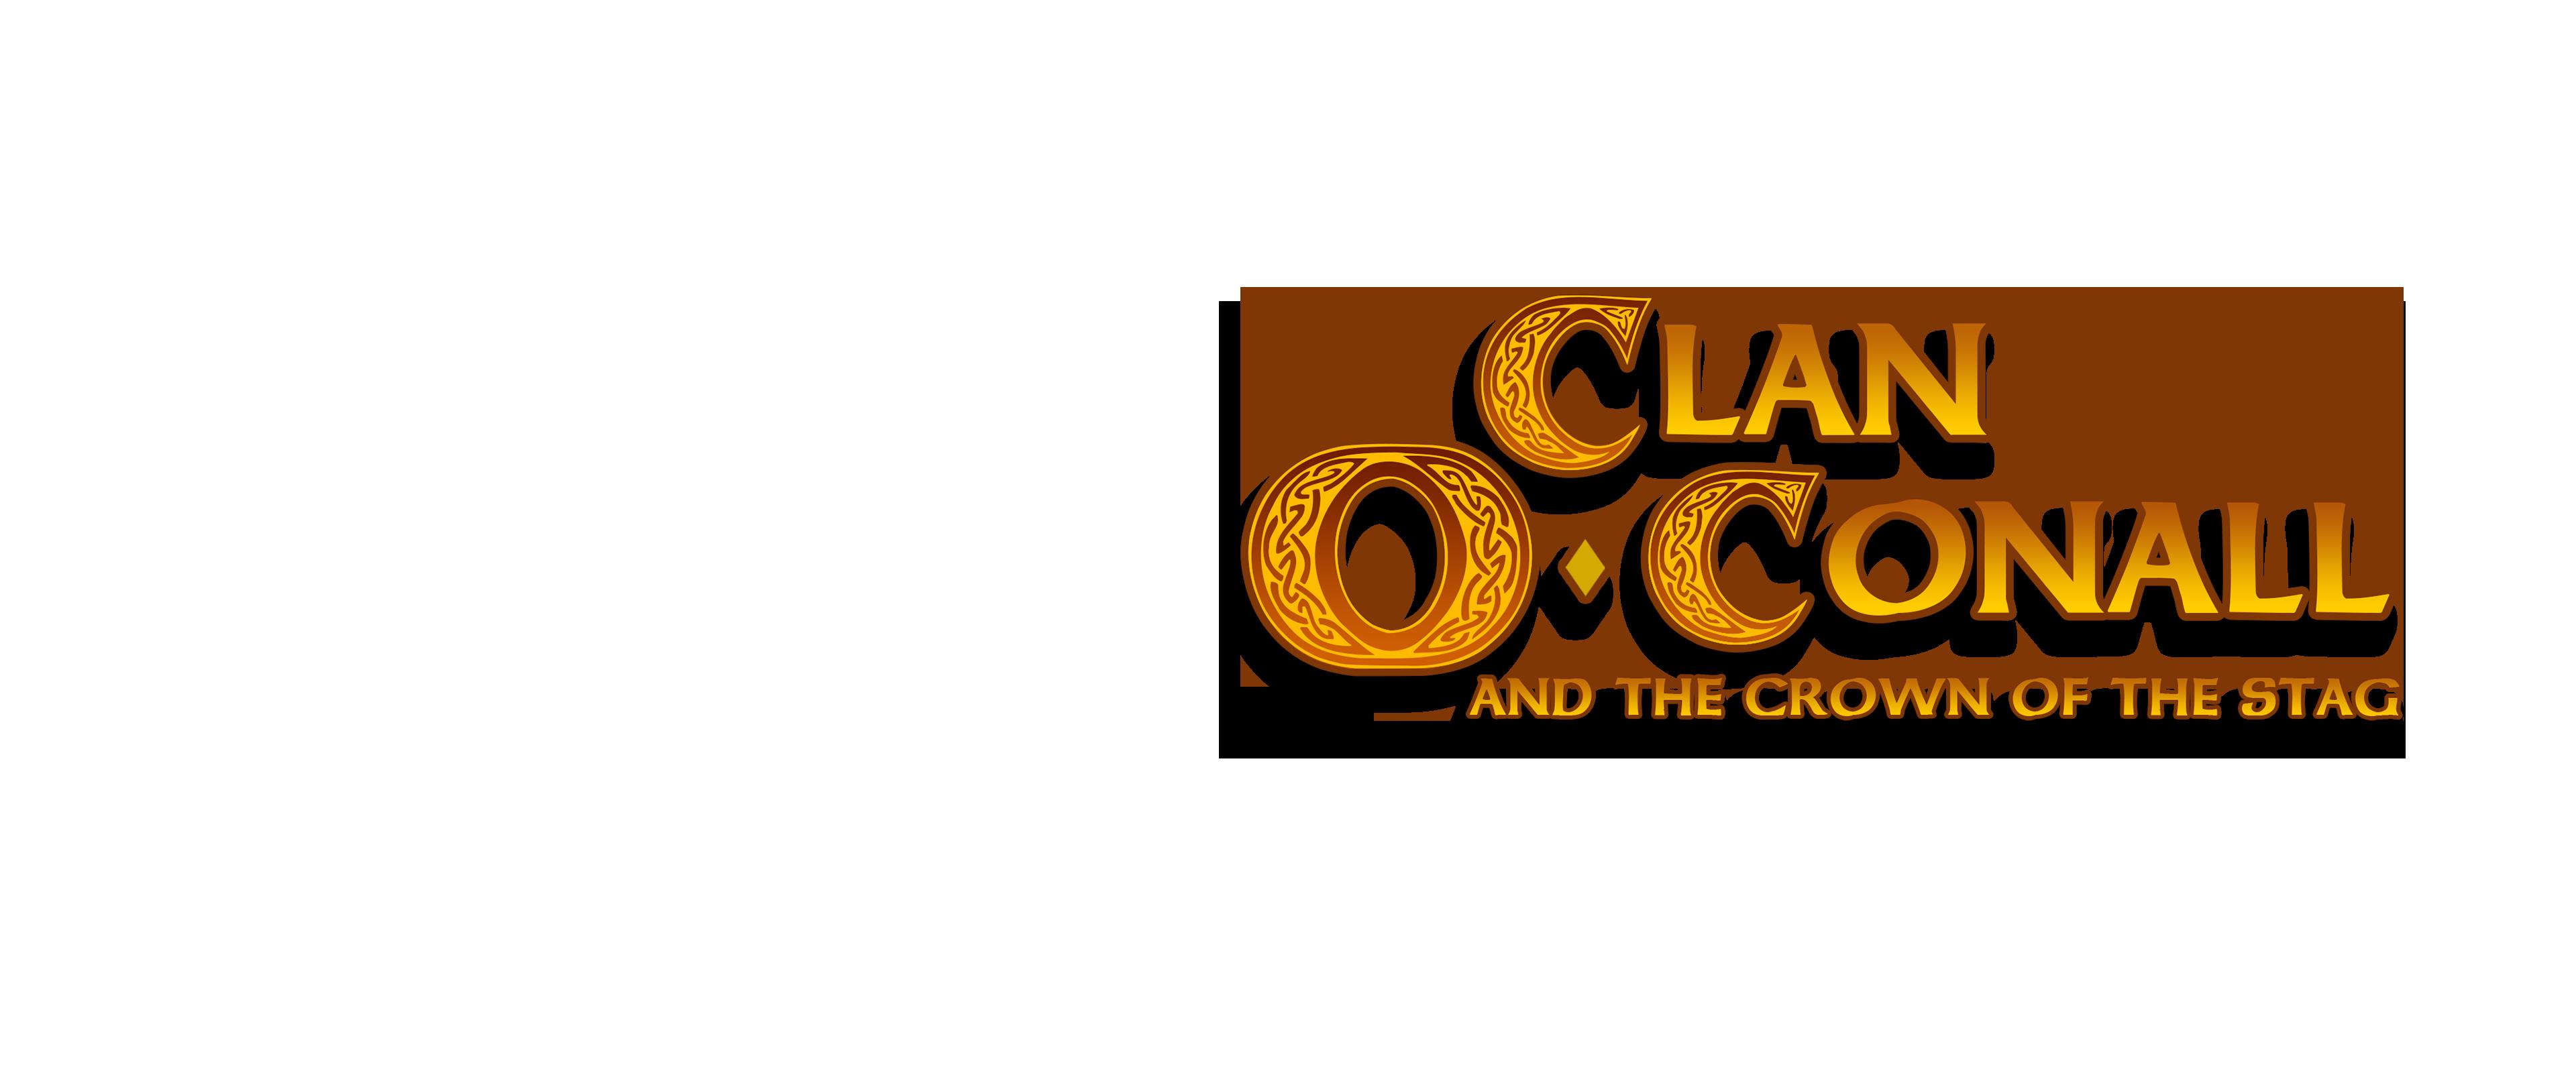 Clan O'Conall title